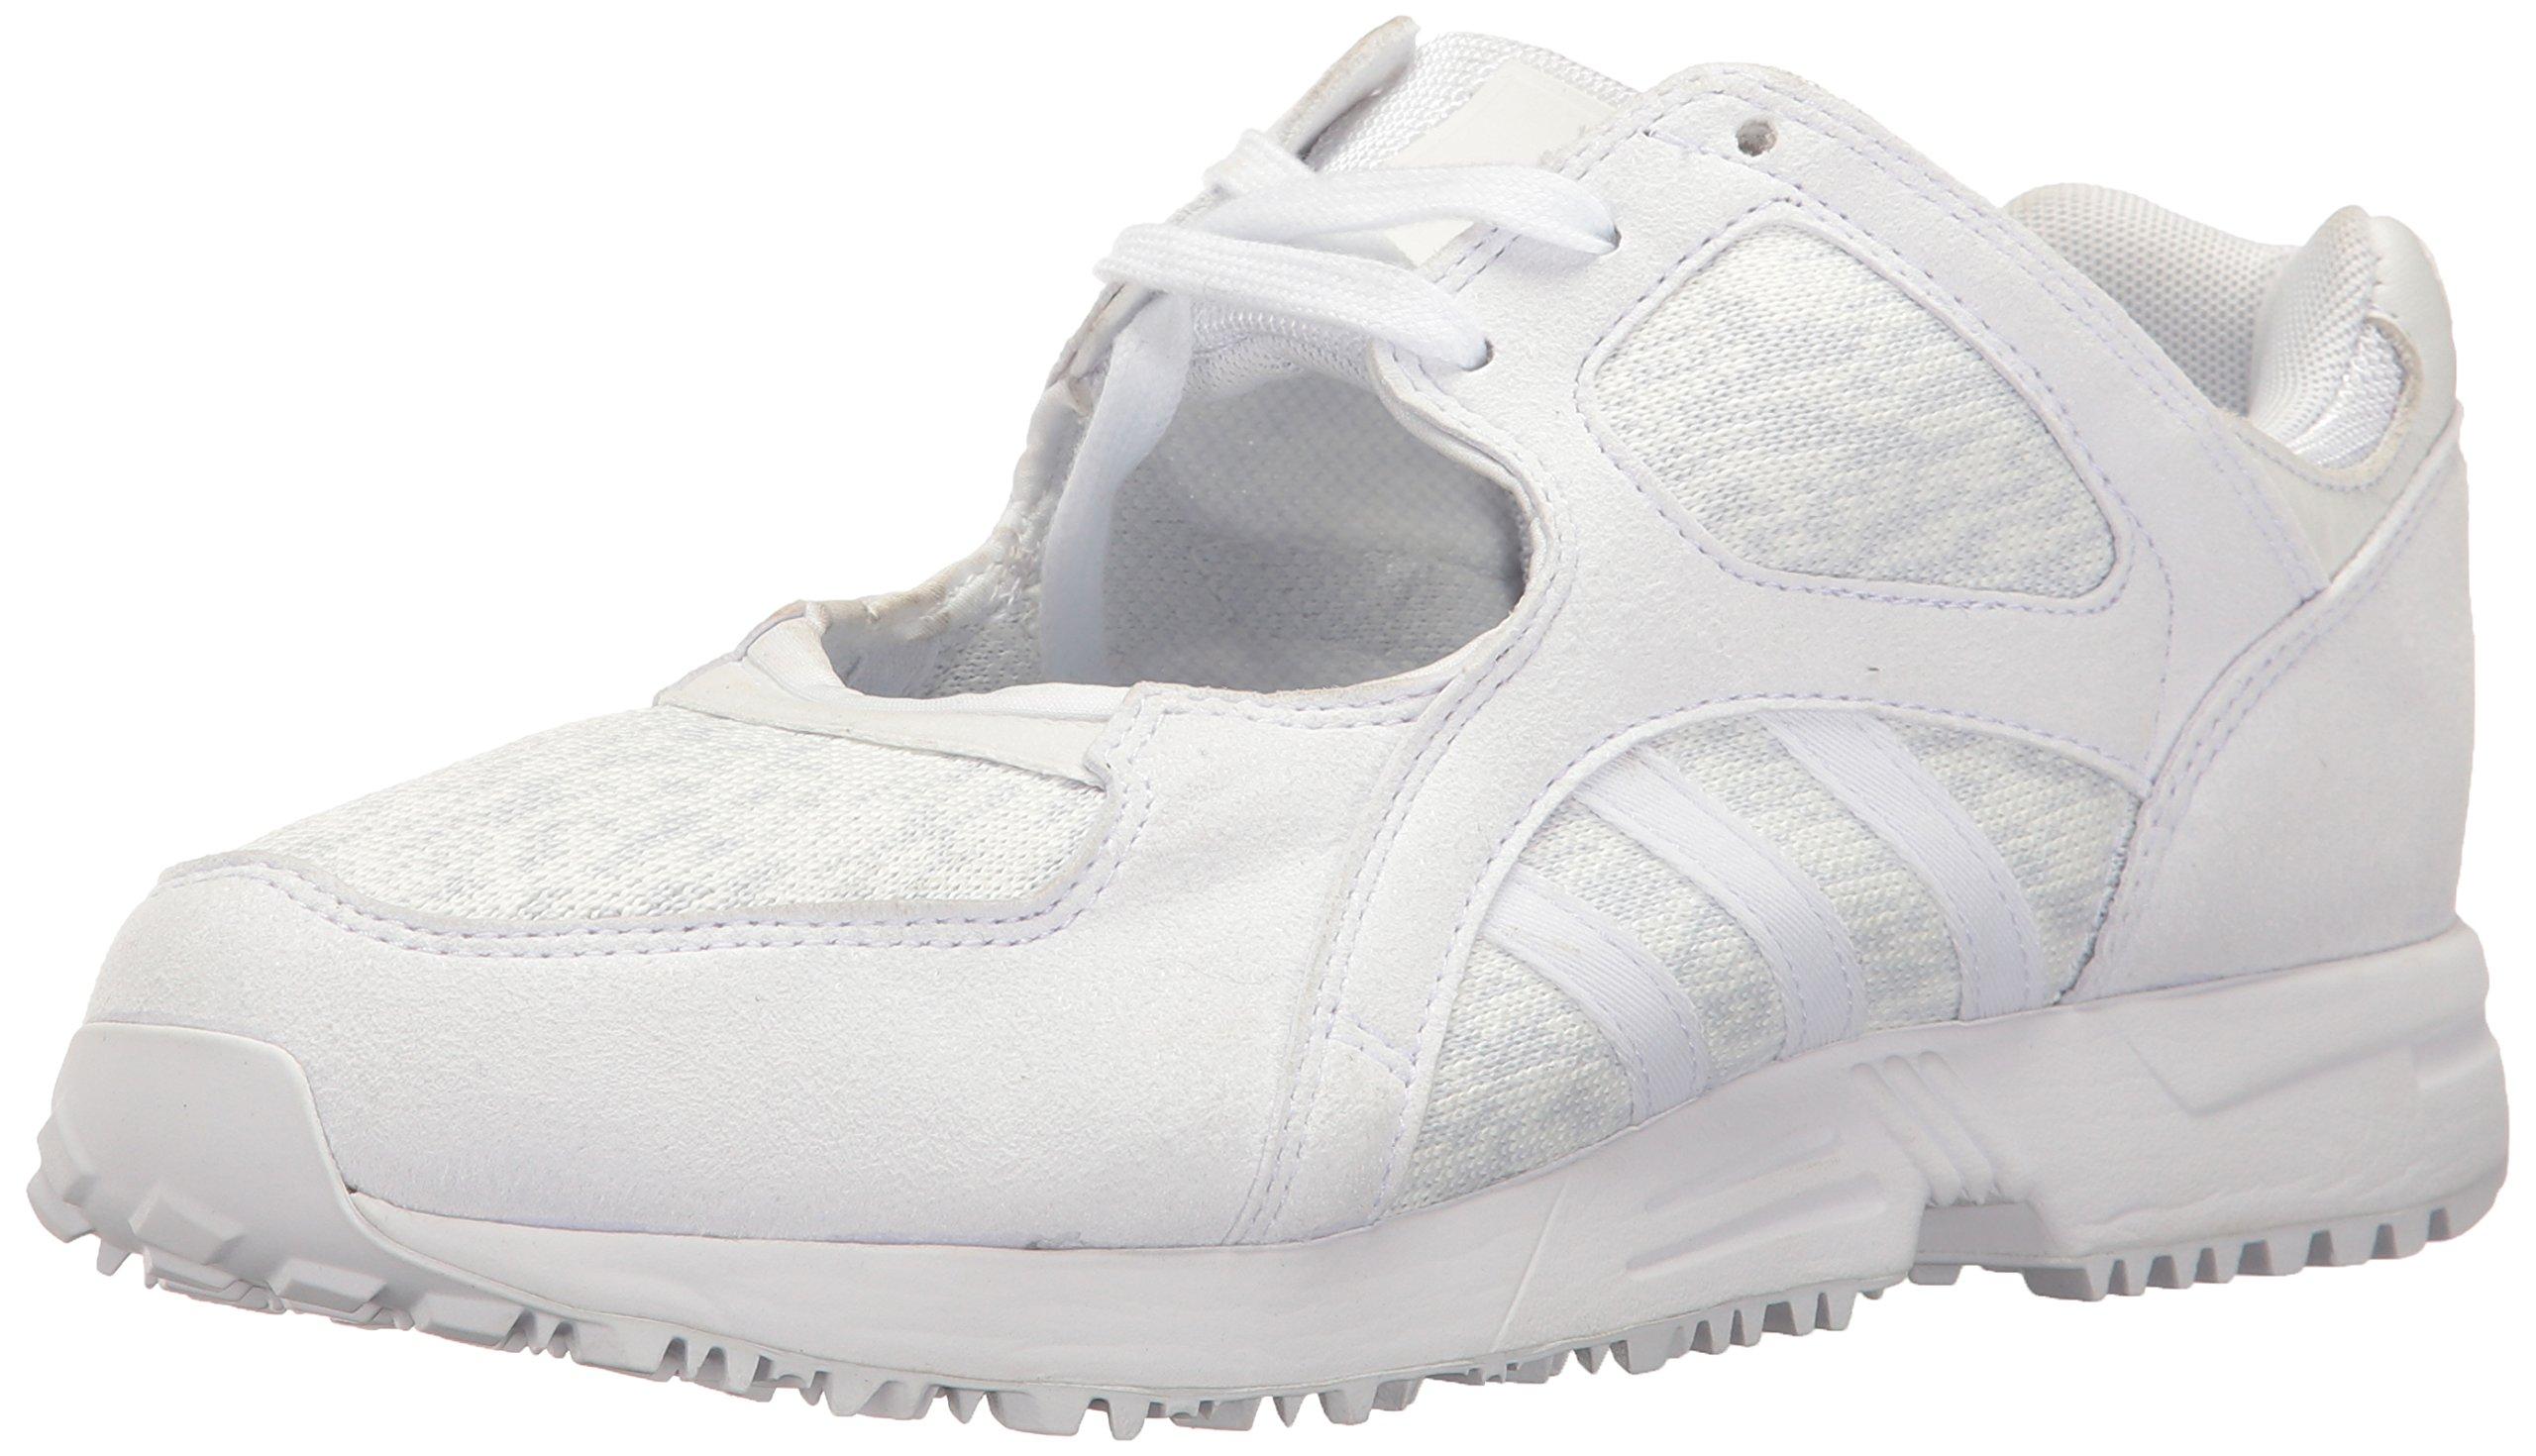 best service 1d854 1c3c3 Galleon - Adidas Originals Womens EQT Racing 91 Fashion Sneaker,  WhiteWhiteTurbo Fabric, (9.5 M US)